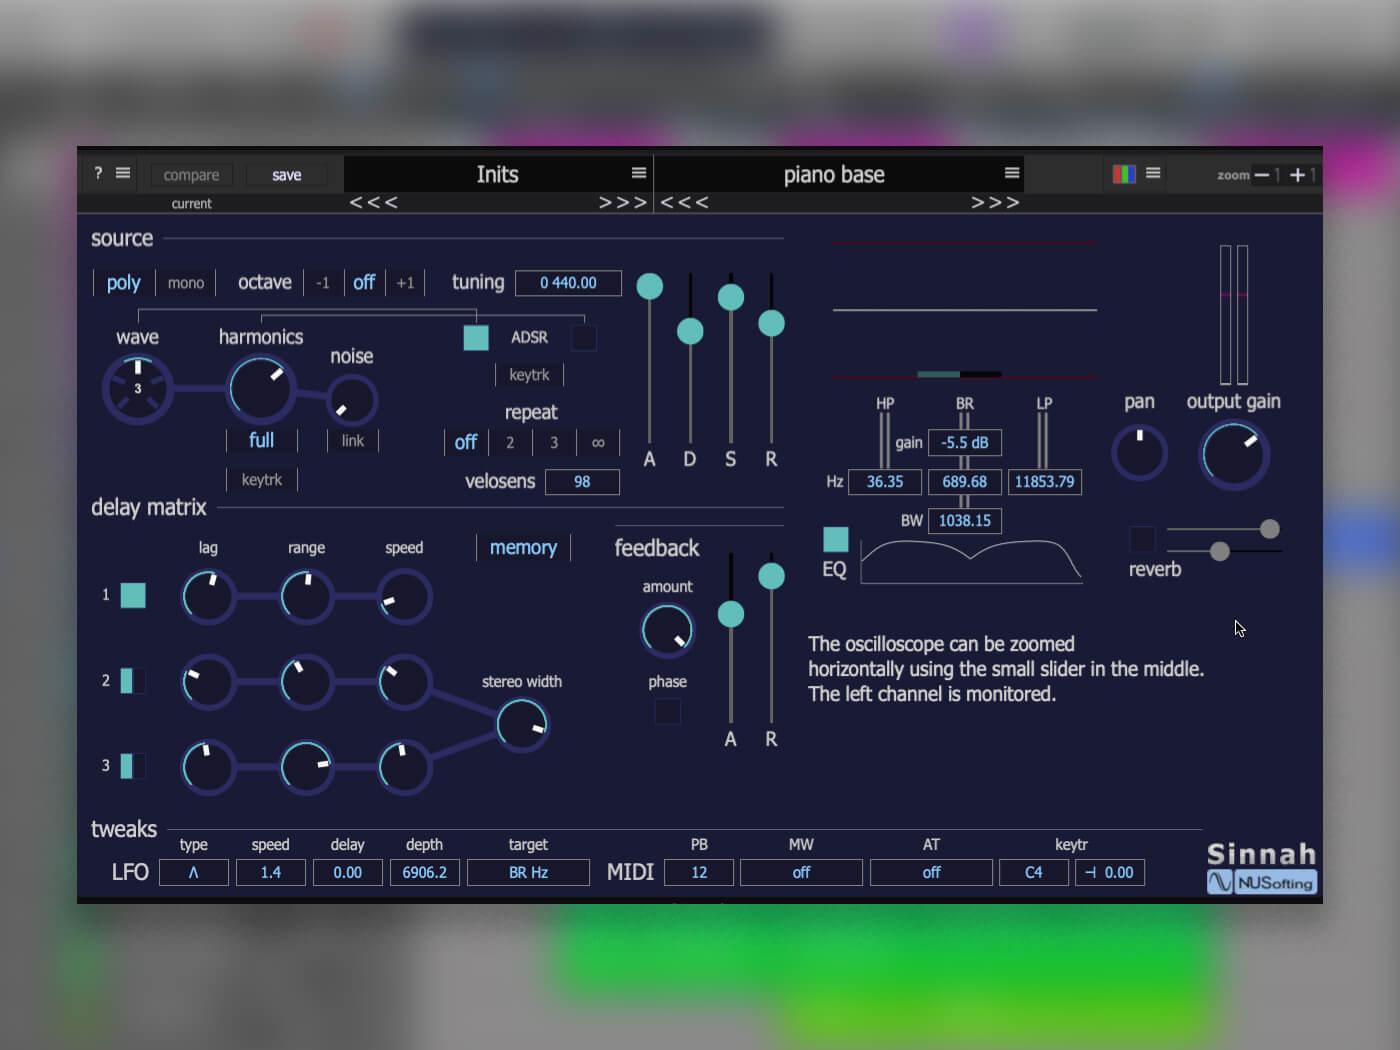 Freeware Tutorial: Ambient pads with feedback using Sinnah